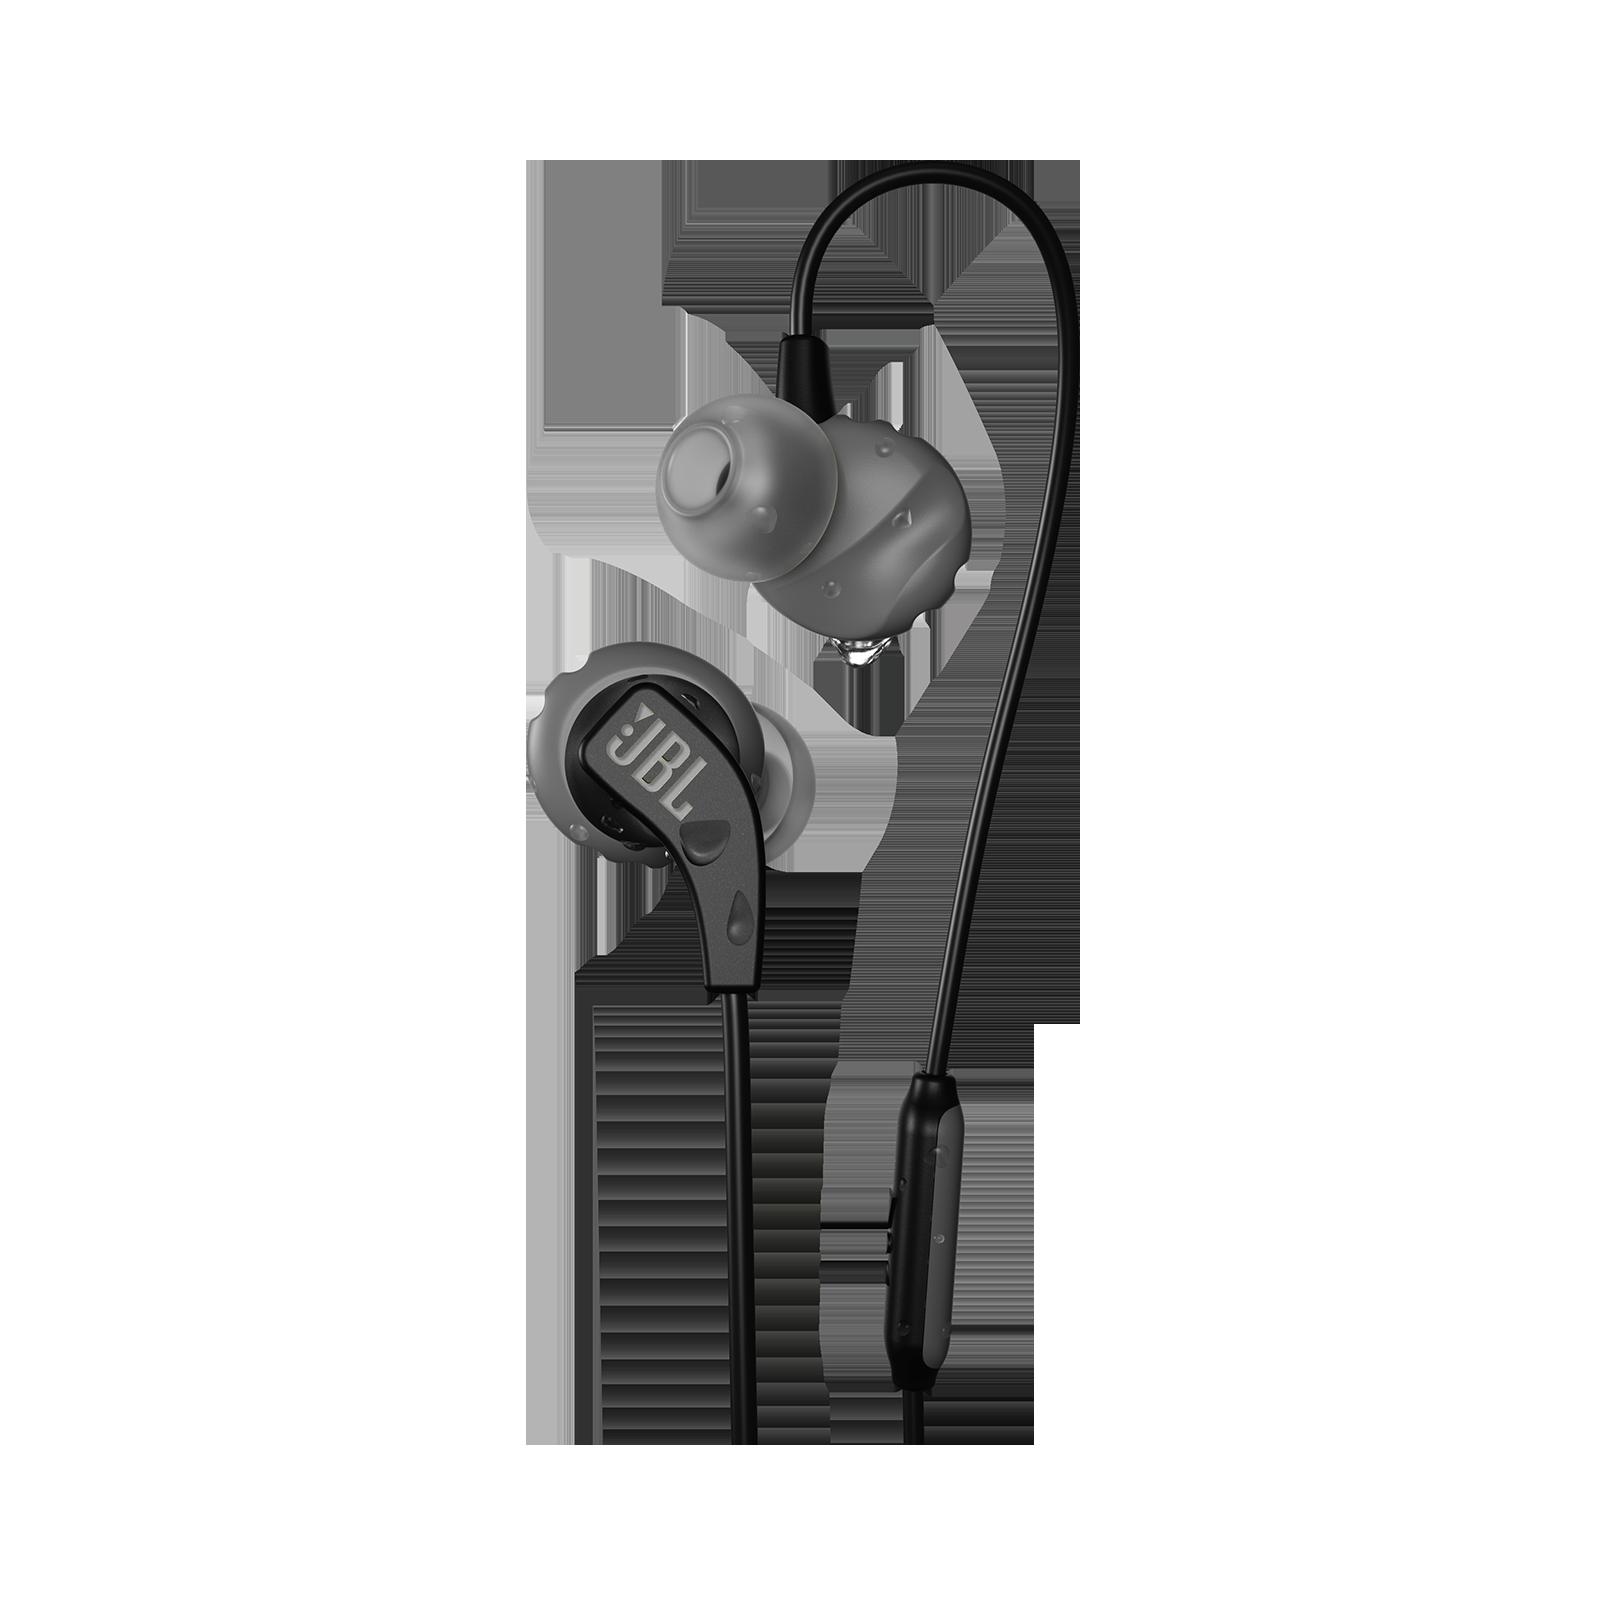 Jbl Endurance Run Sweatproof Wired Sport In Ear Headphones